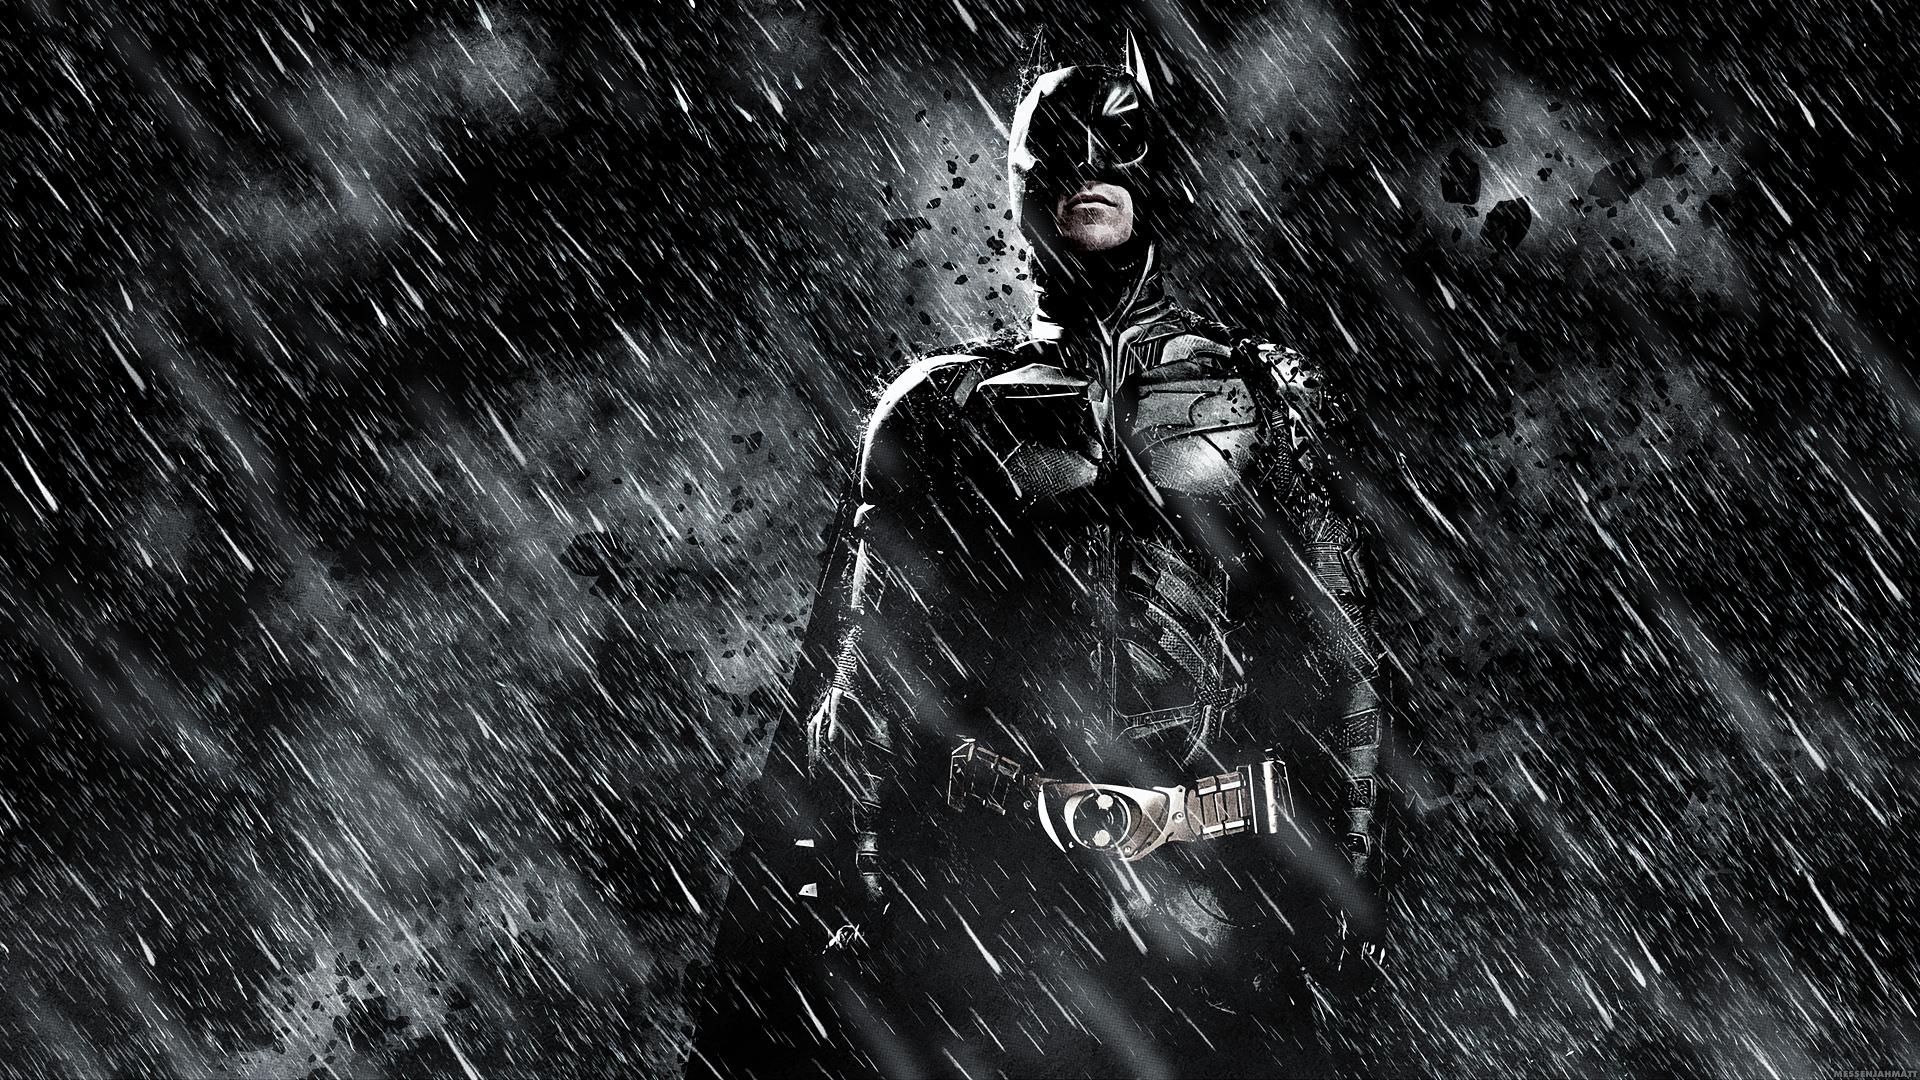 Batman in The Dark Knight Rises Wallpapers HD Wallpapers 1920x1080